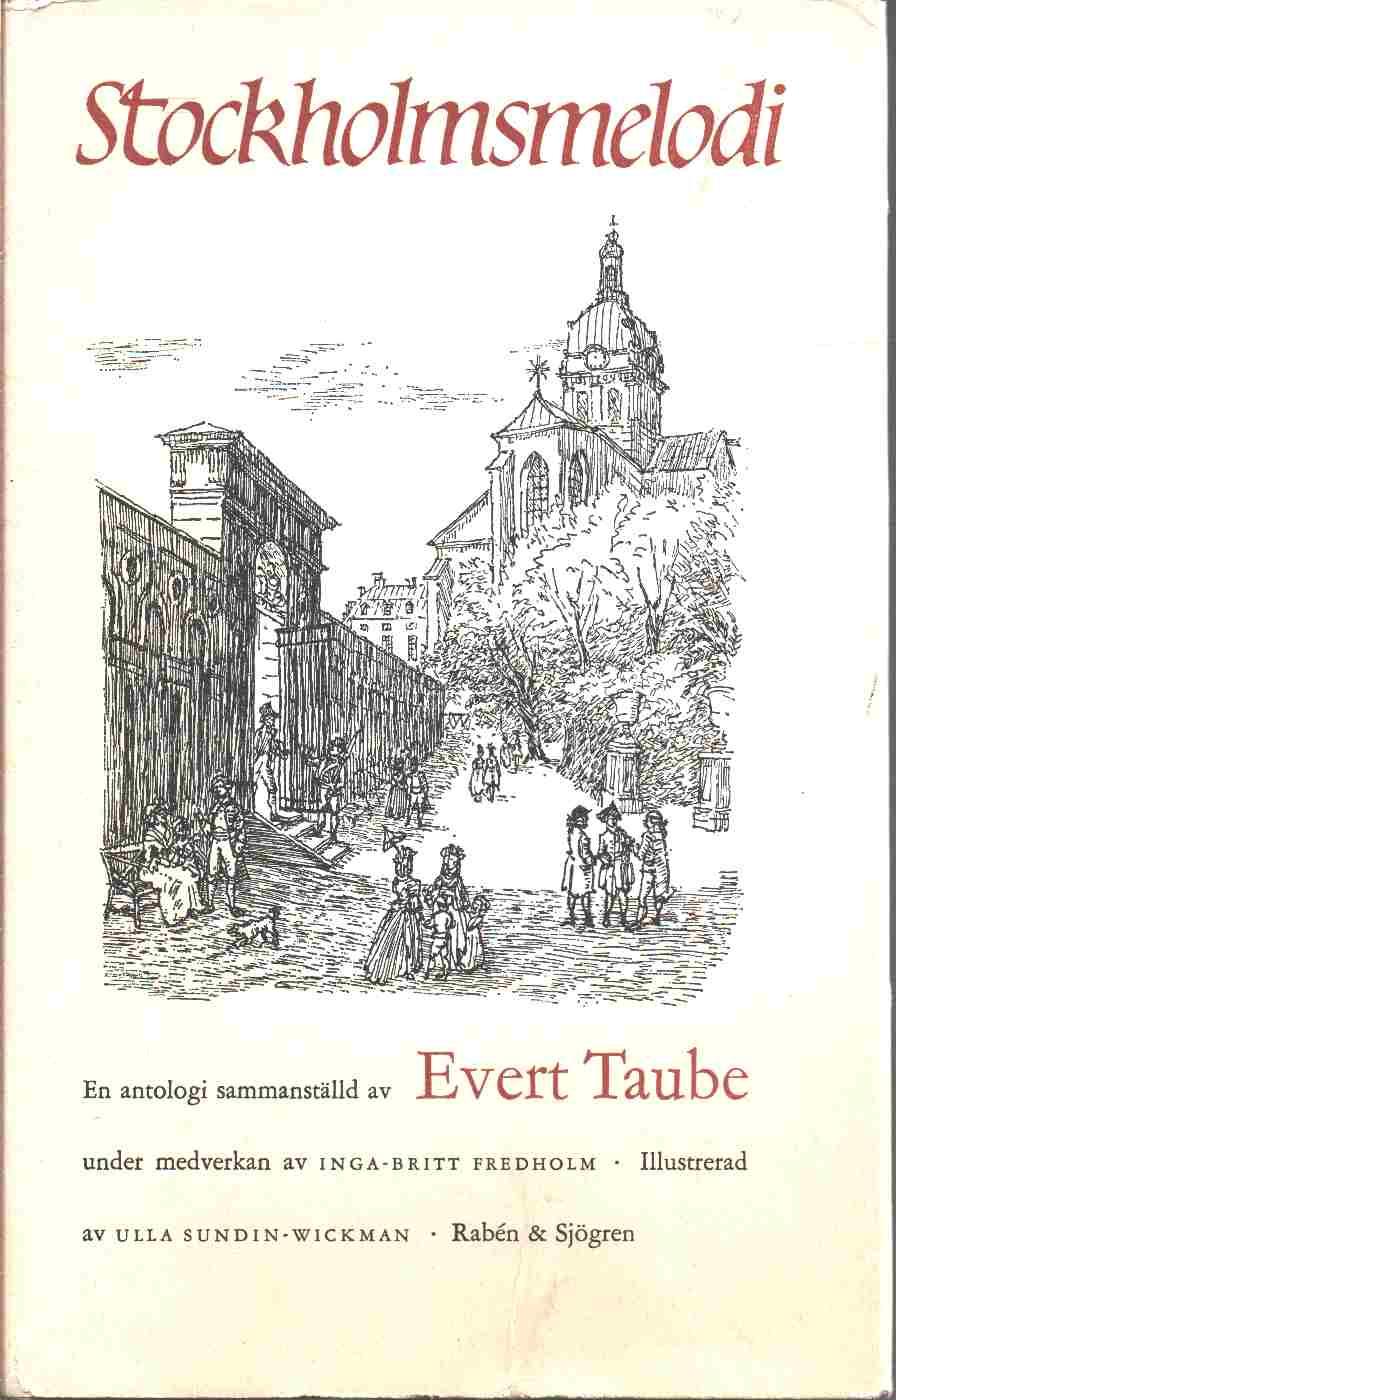 Stockholmsmelodi : en antologi - Red. Fredholm, Inga-Britt och Taube, Evert